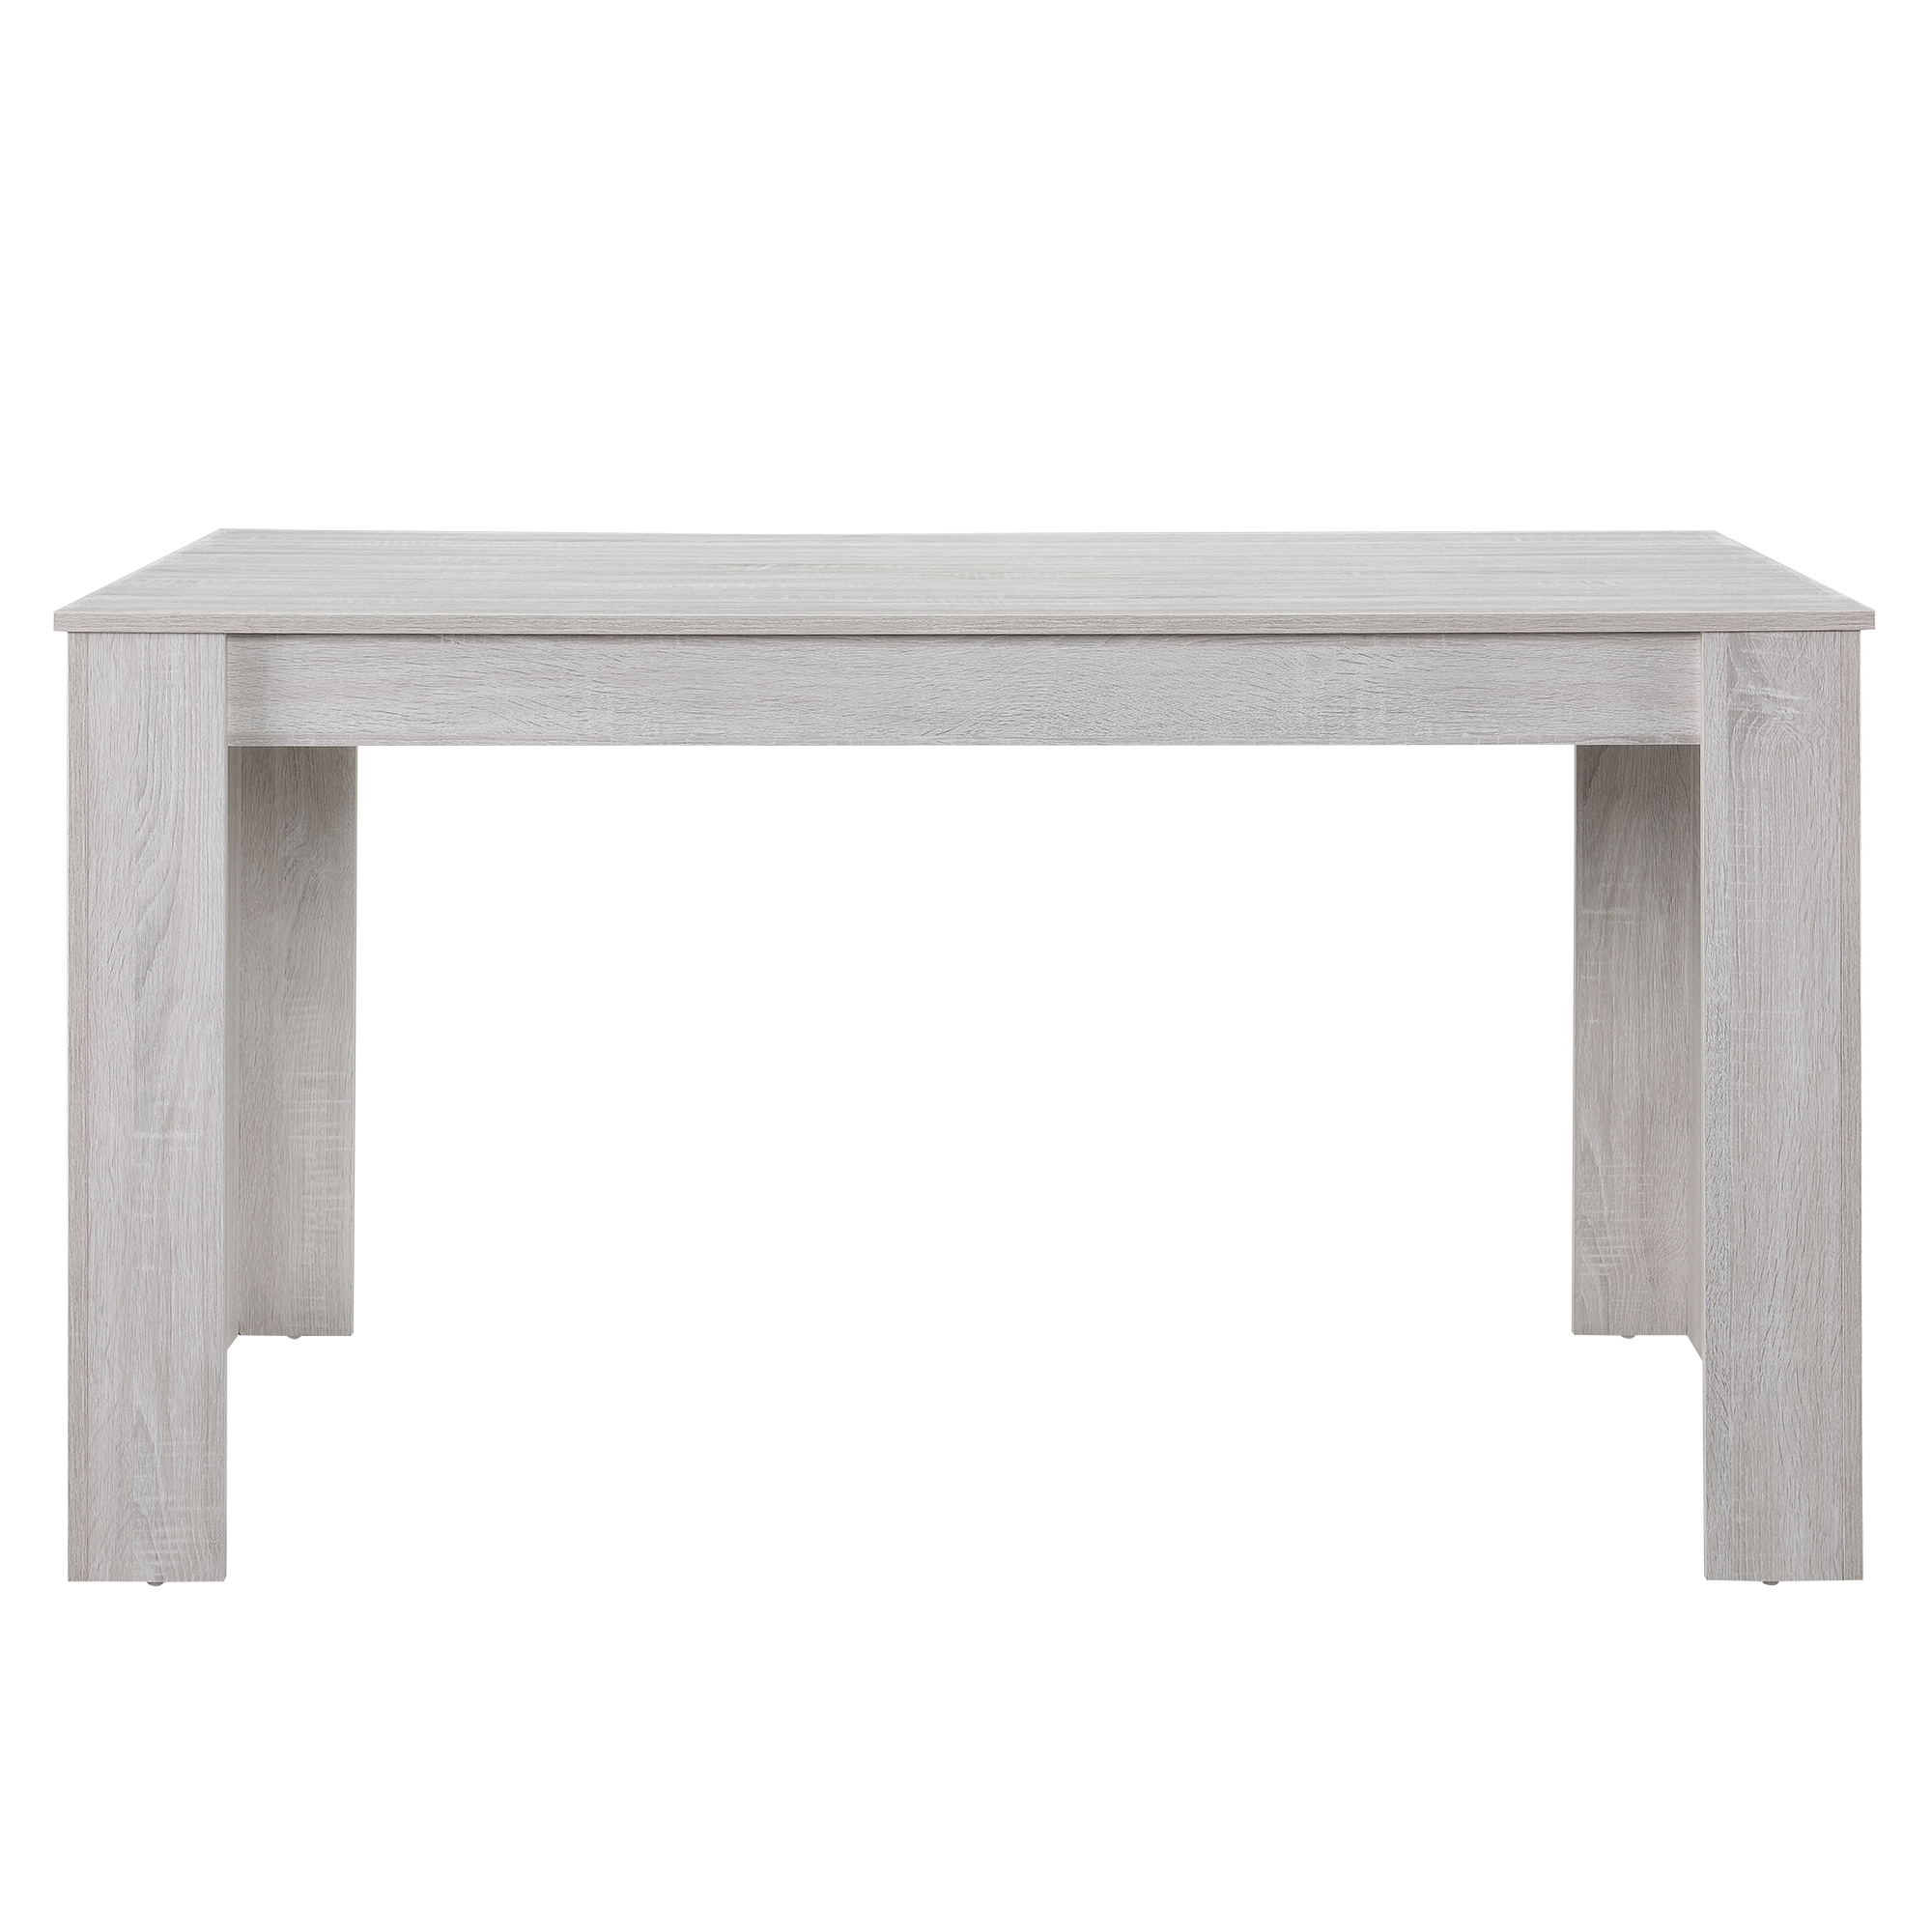 [en.casa]® Jídelní stůl 'Nora' HTFU1403 - dub bílý